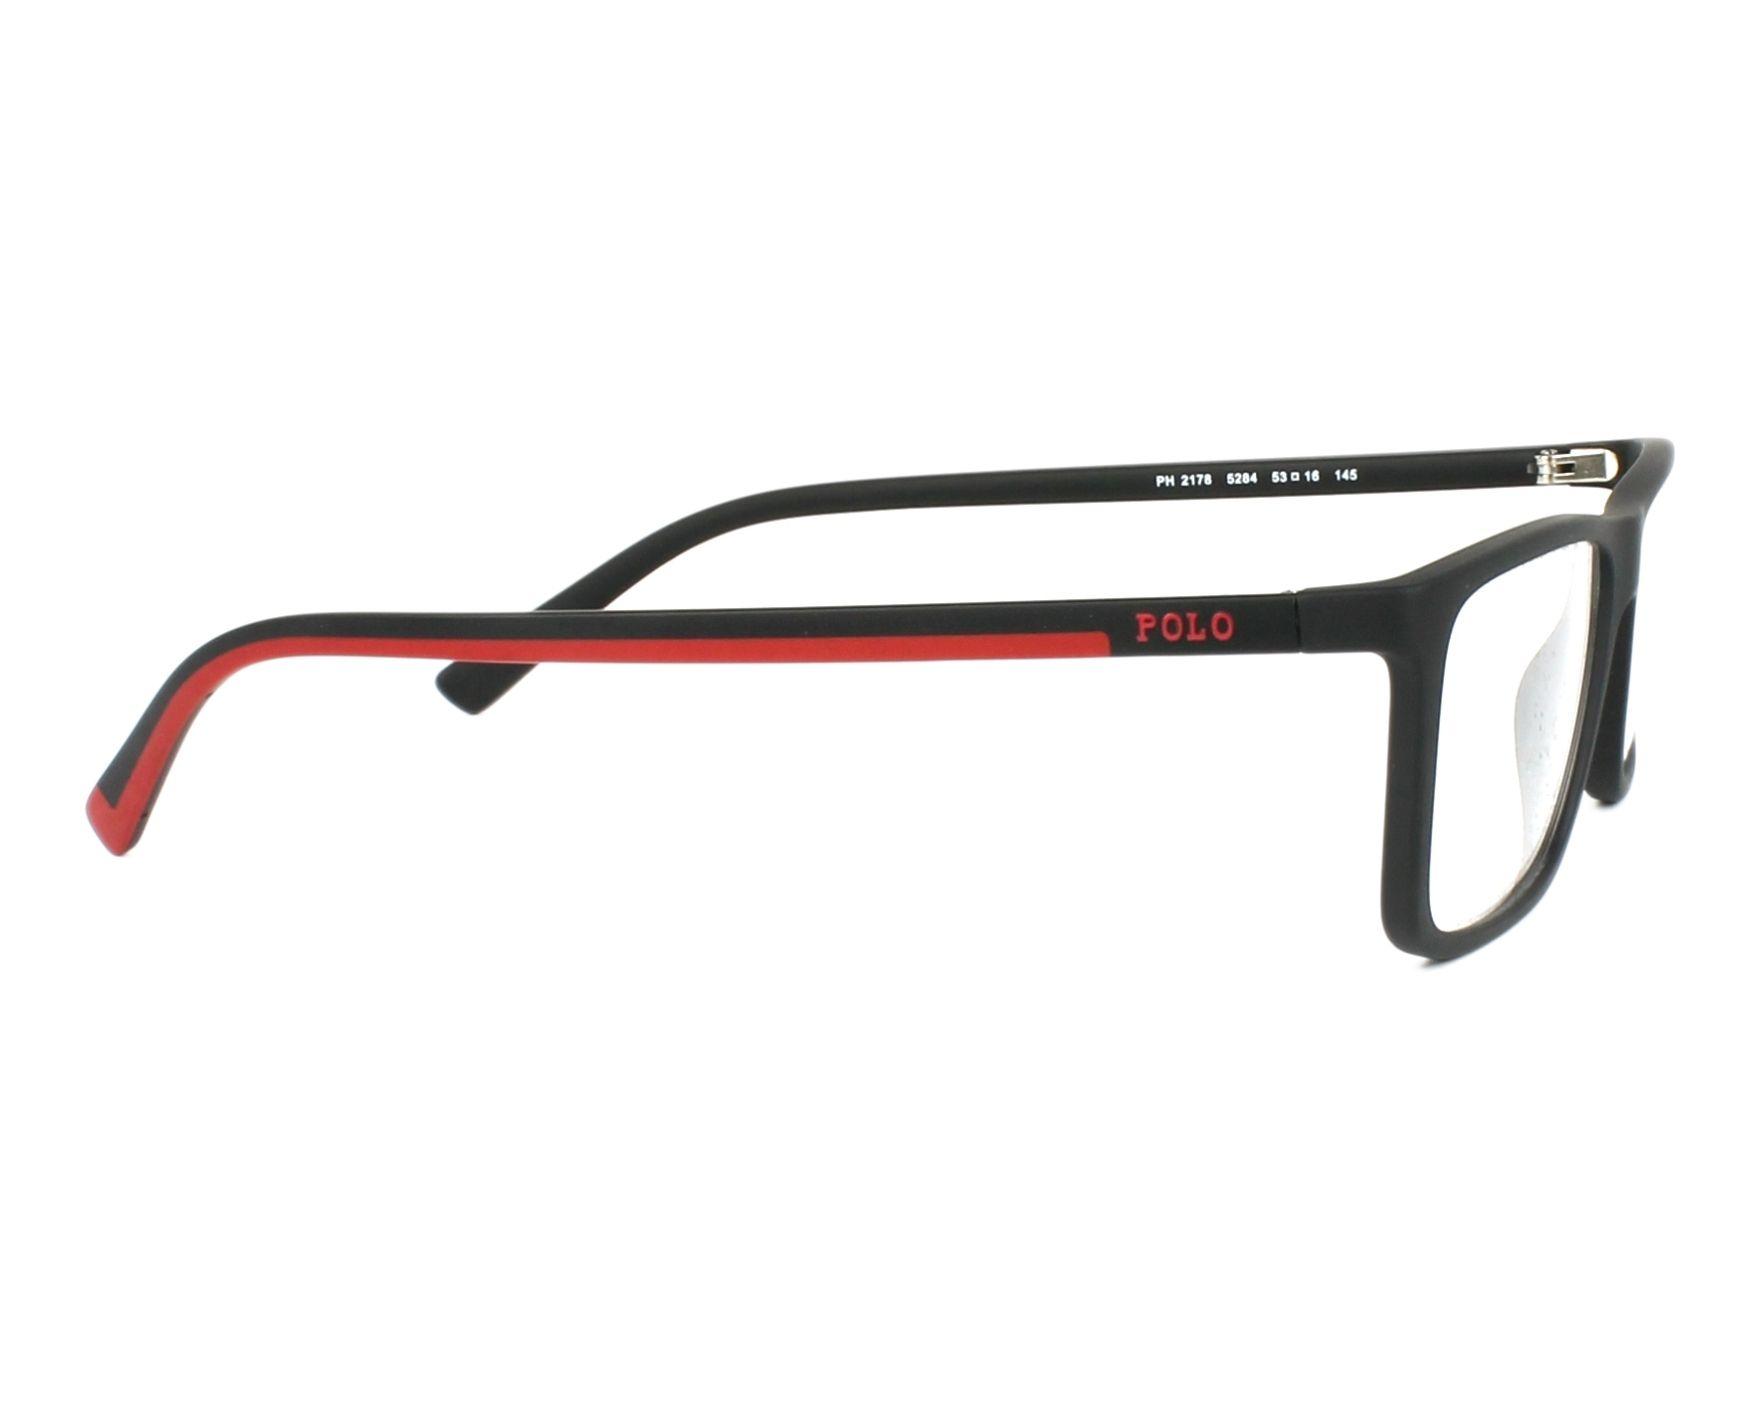 d9ae64fa024 eyeglasses Polo Ralph Lauren PH-2178 5284 53-16 Black Red side view